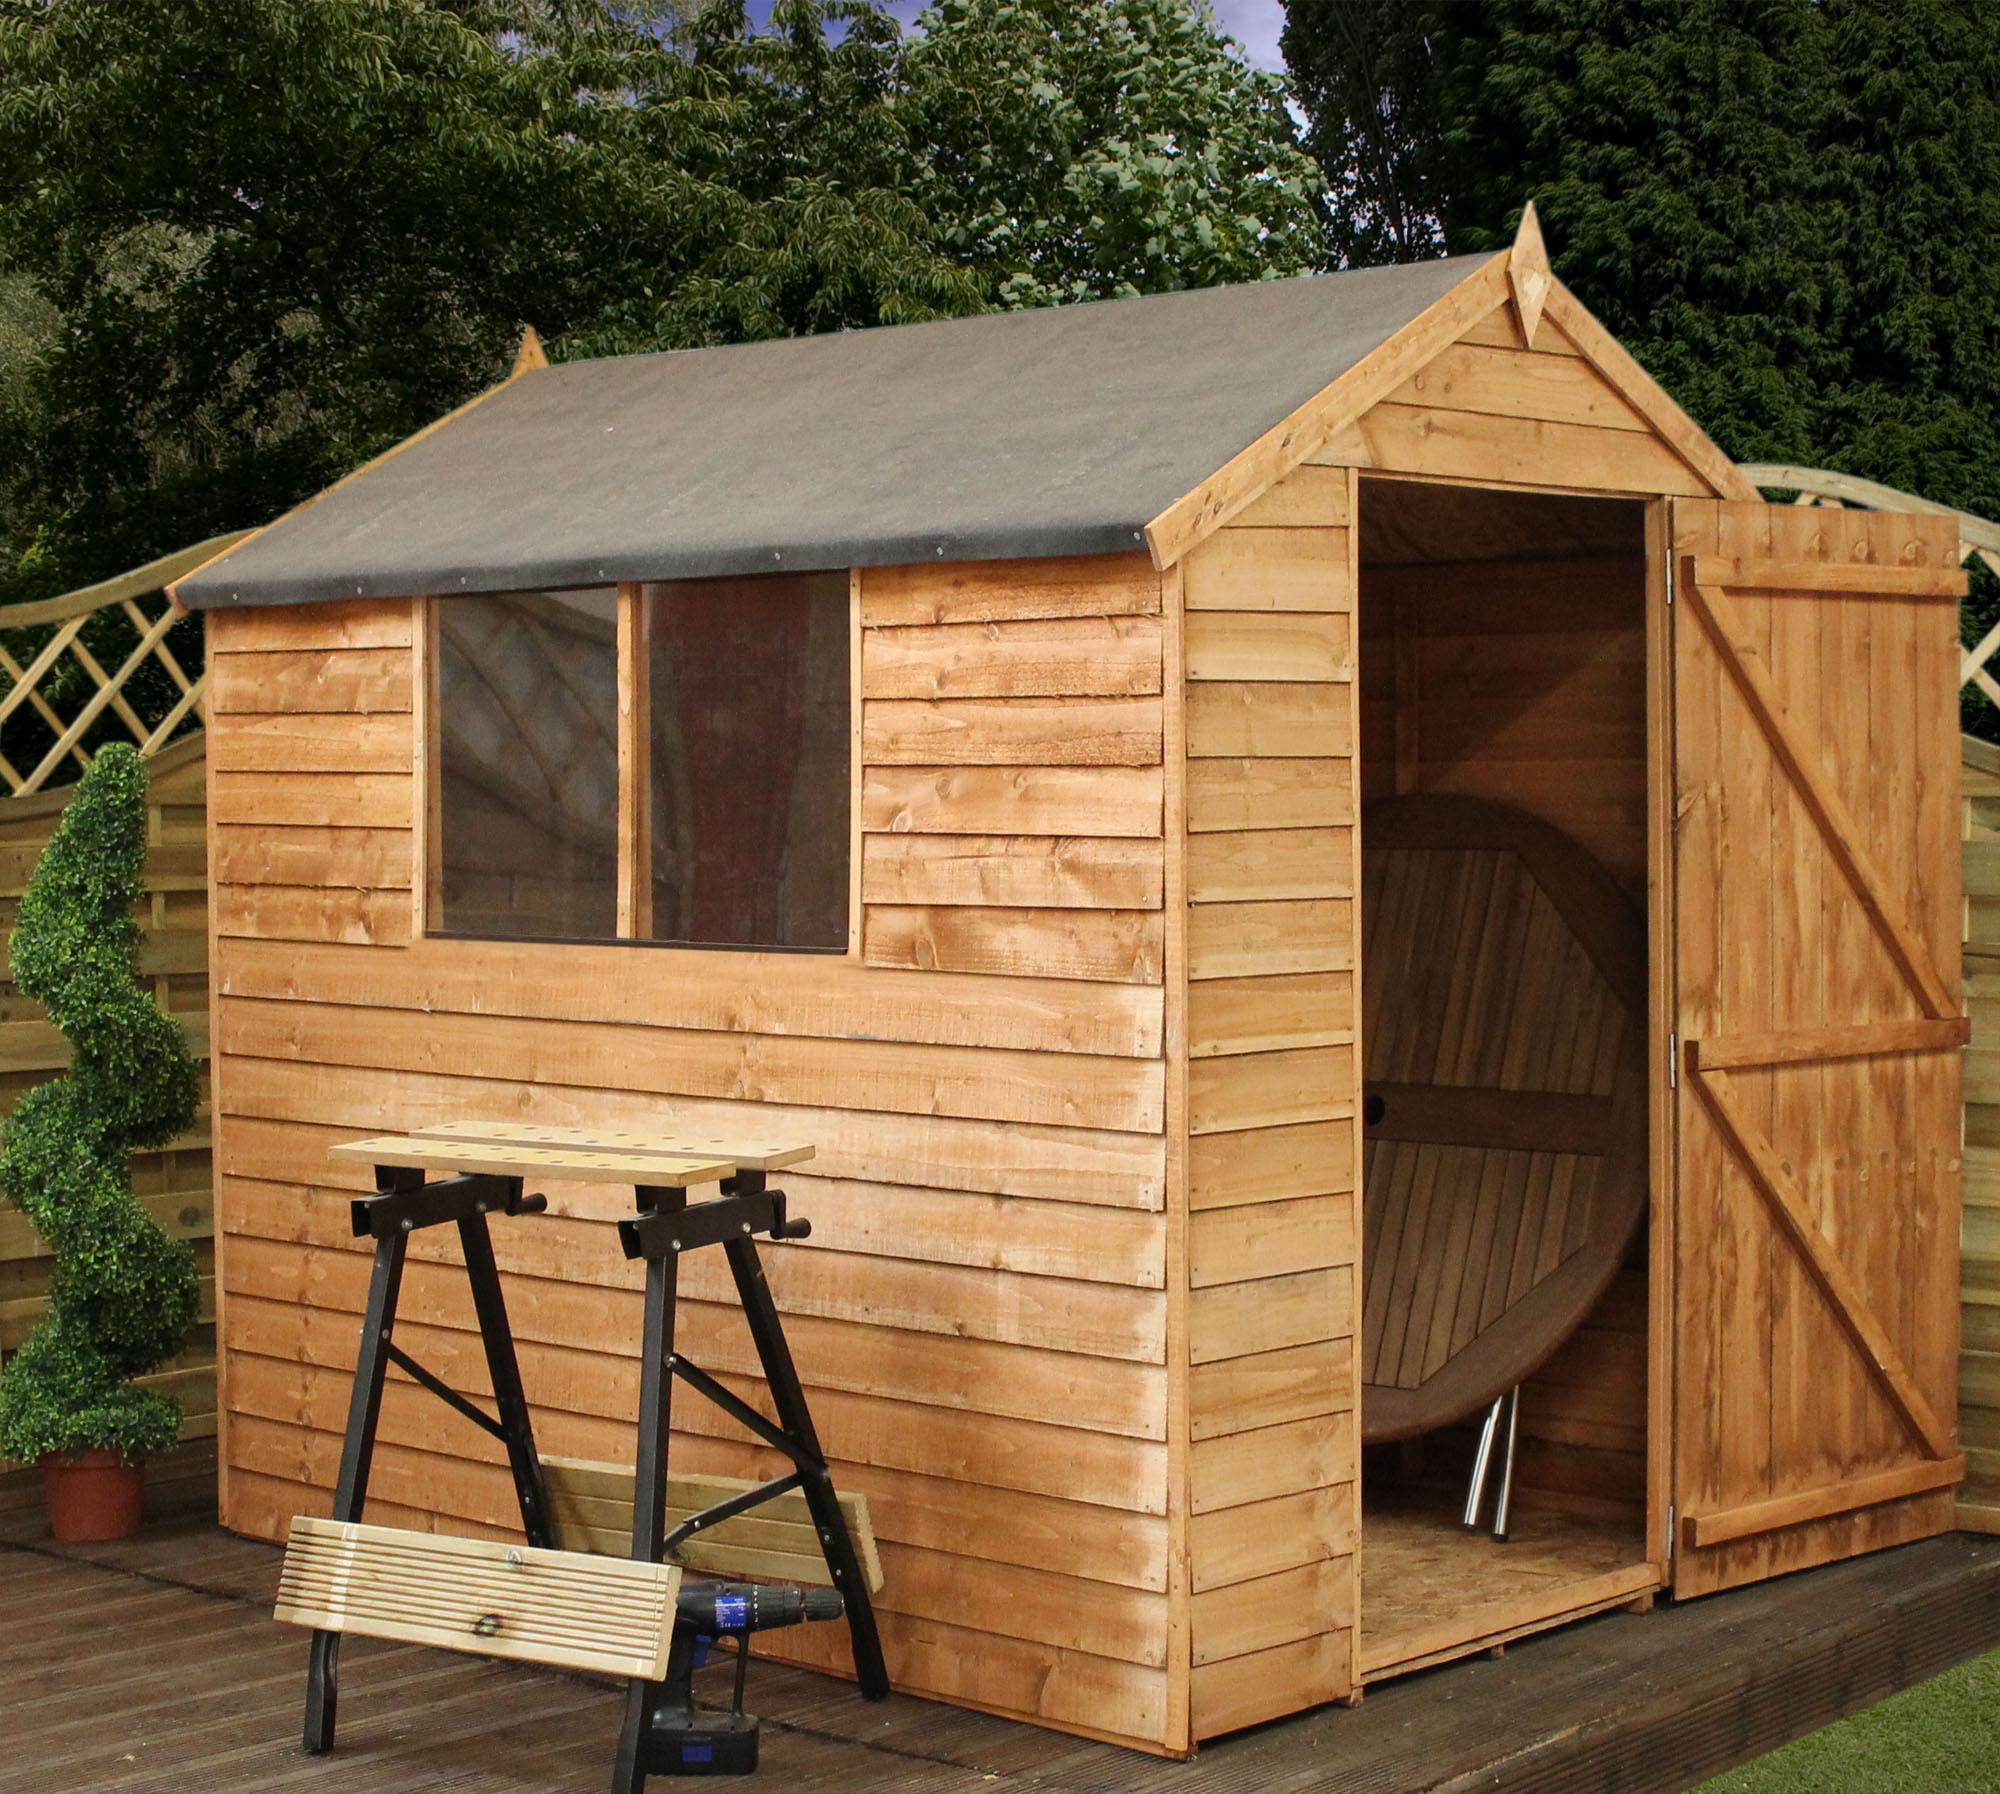 7 X 5 Escape Overlap Wooden Garden Shed